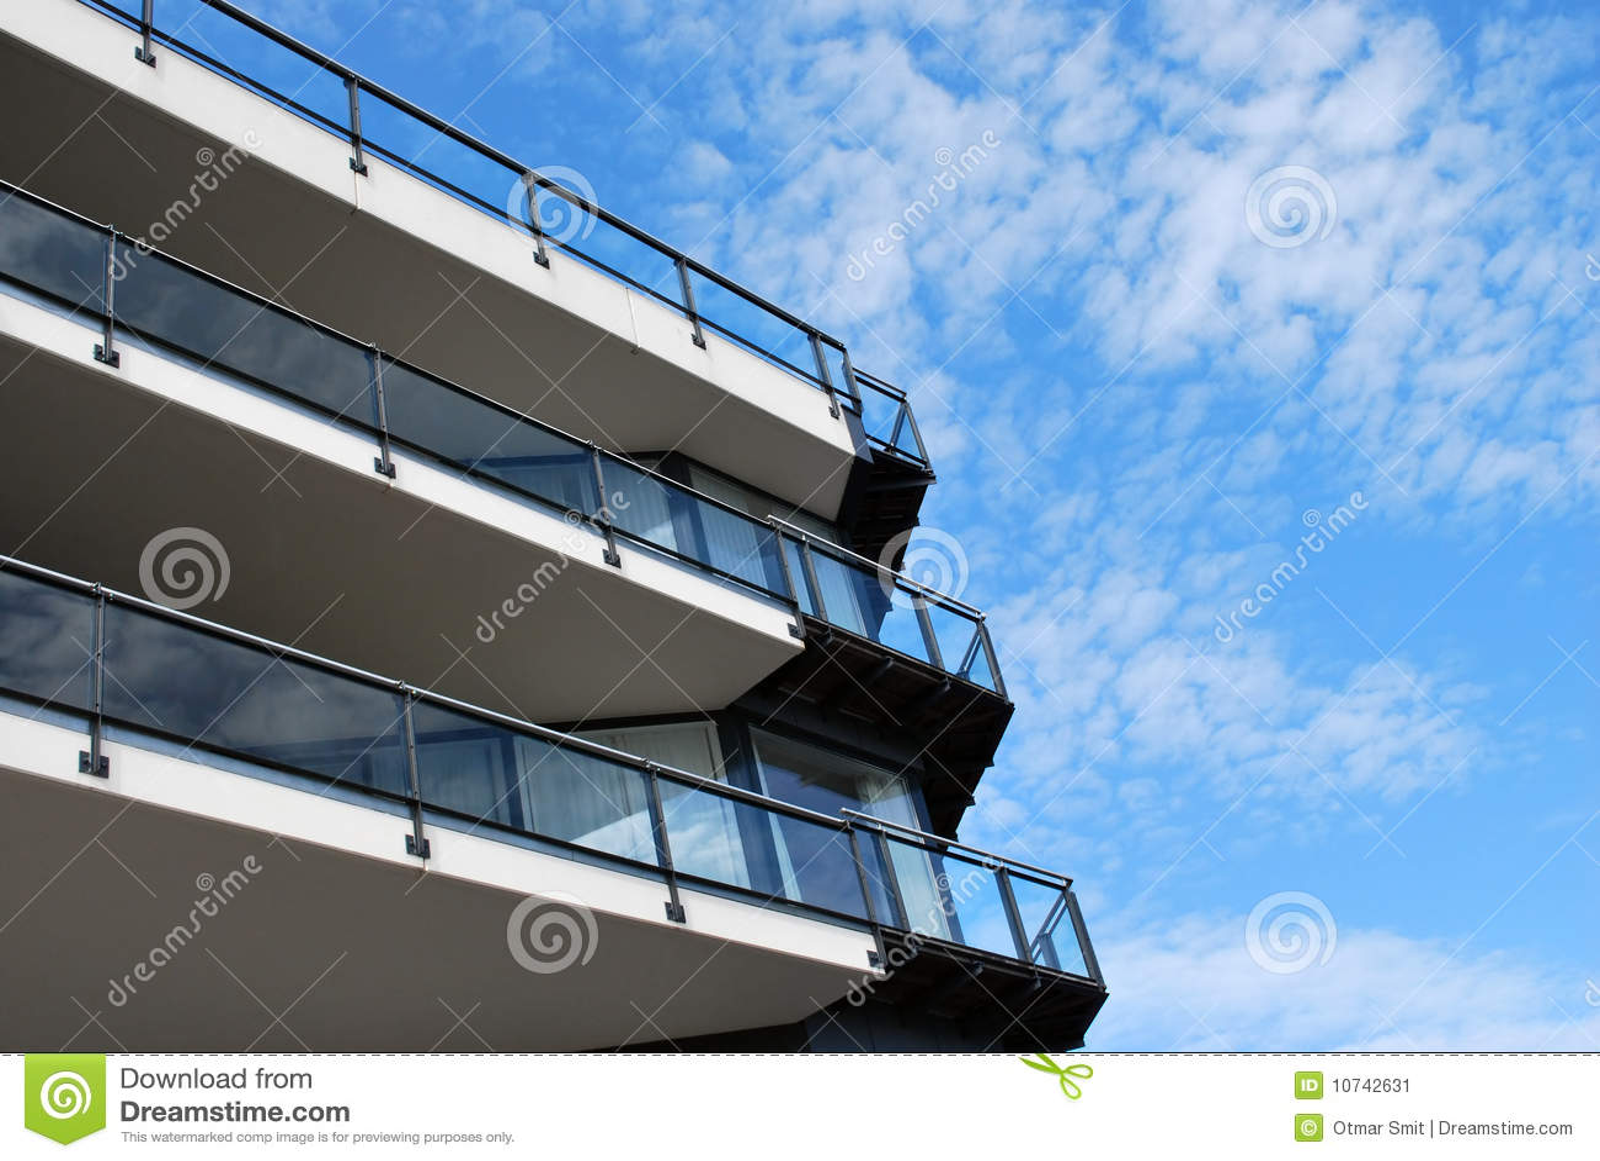 Edificio Balconied